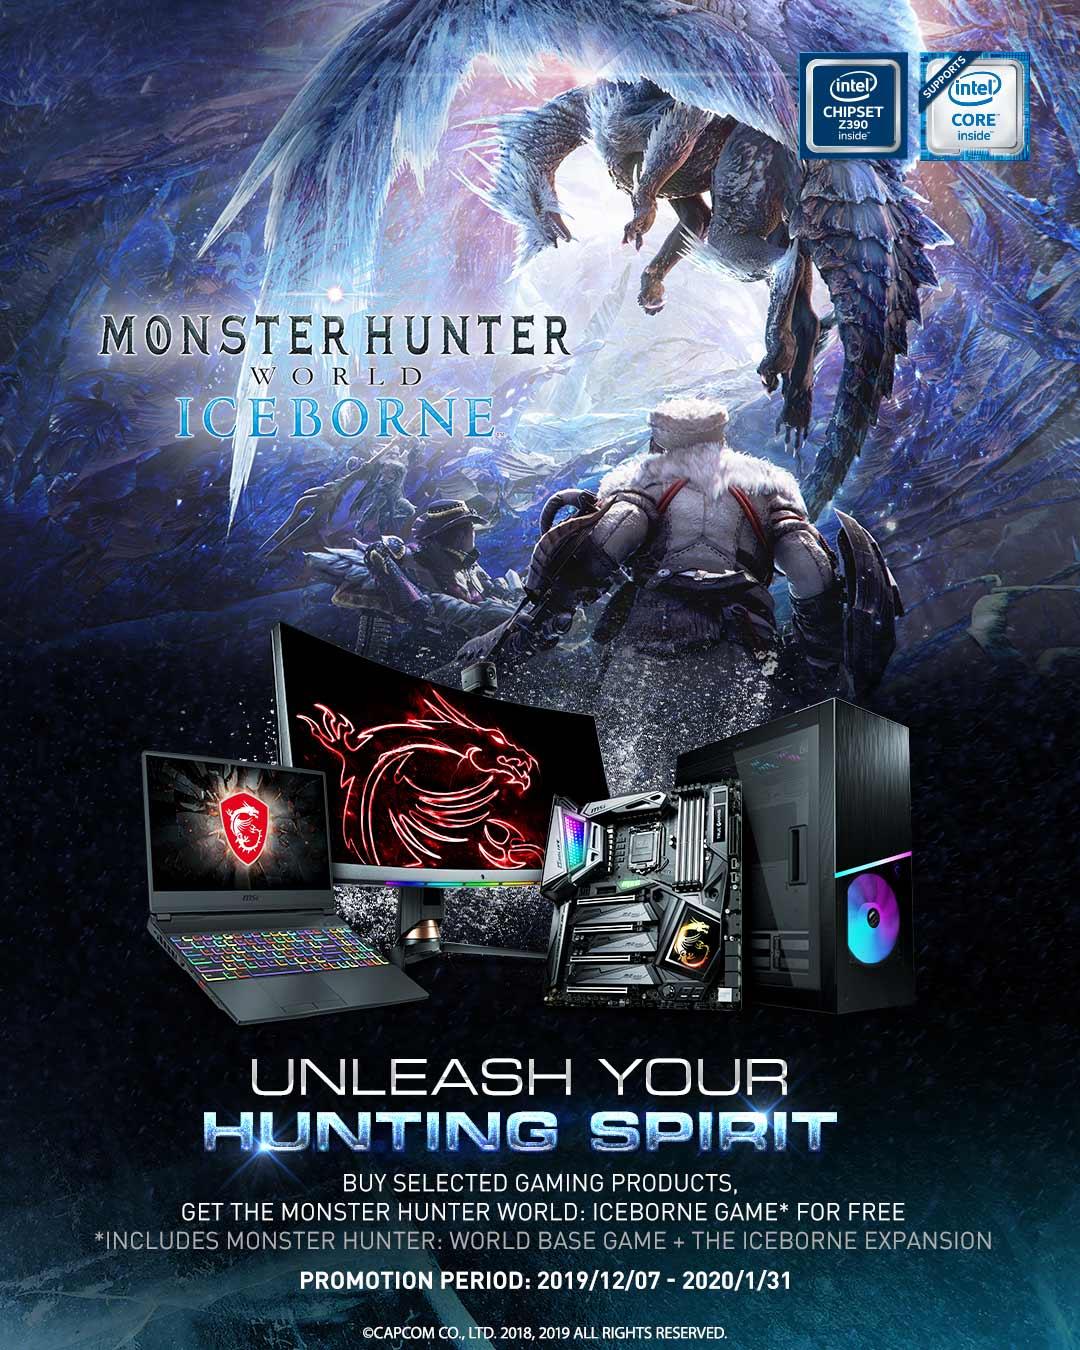 Unleash your hunting spirit